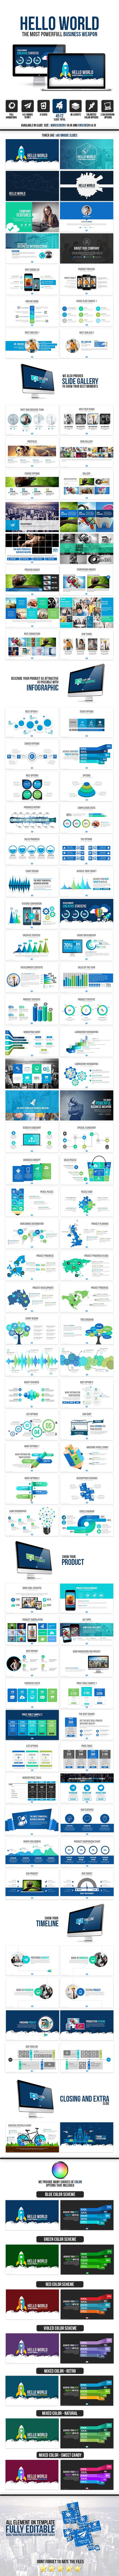 Hello World Presentation Template - Business PowerPoint Templates